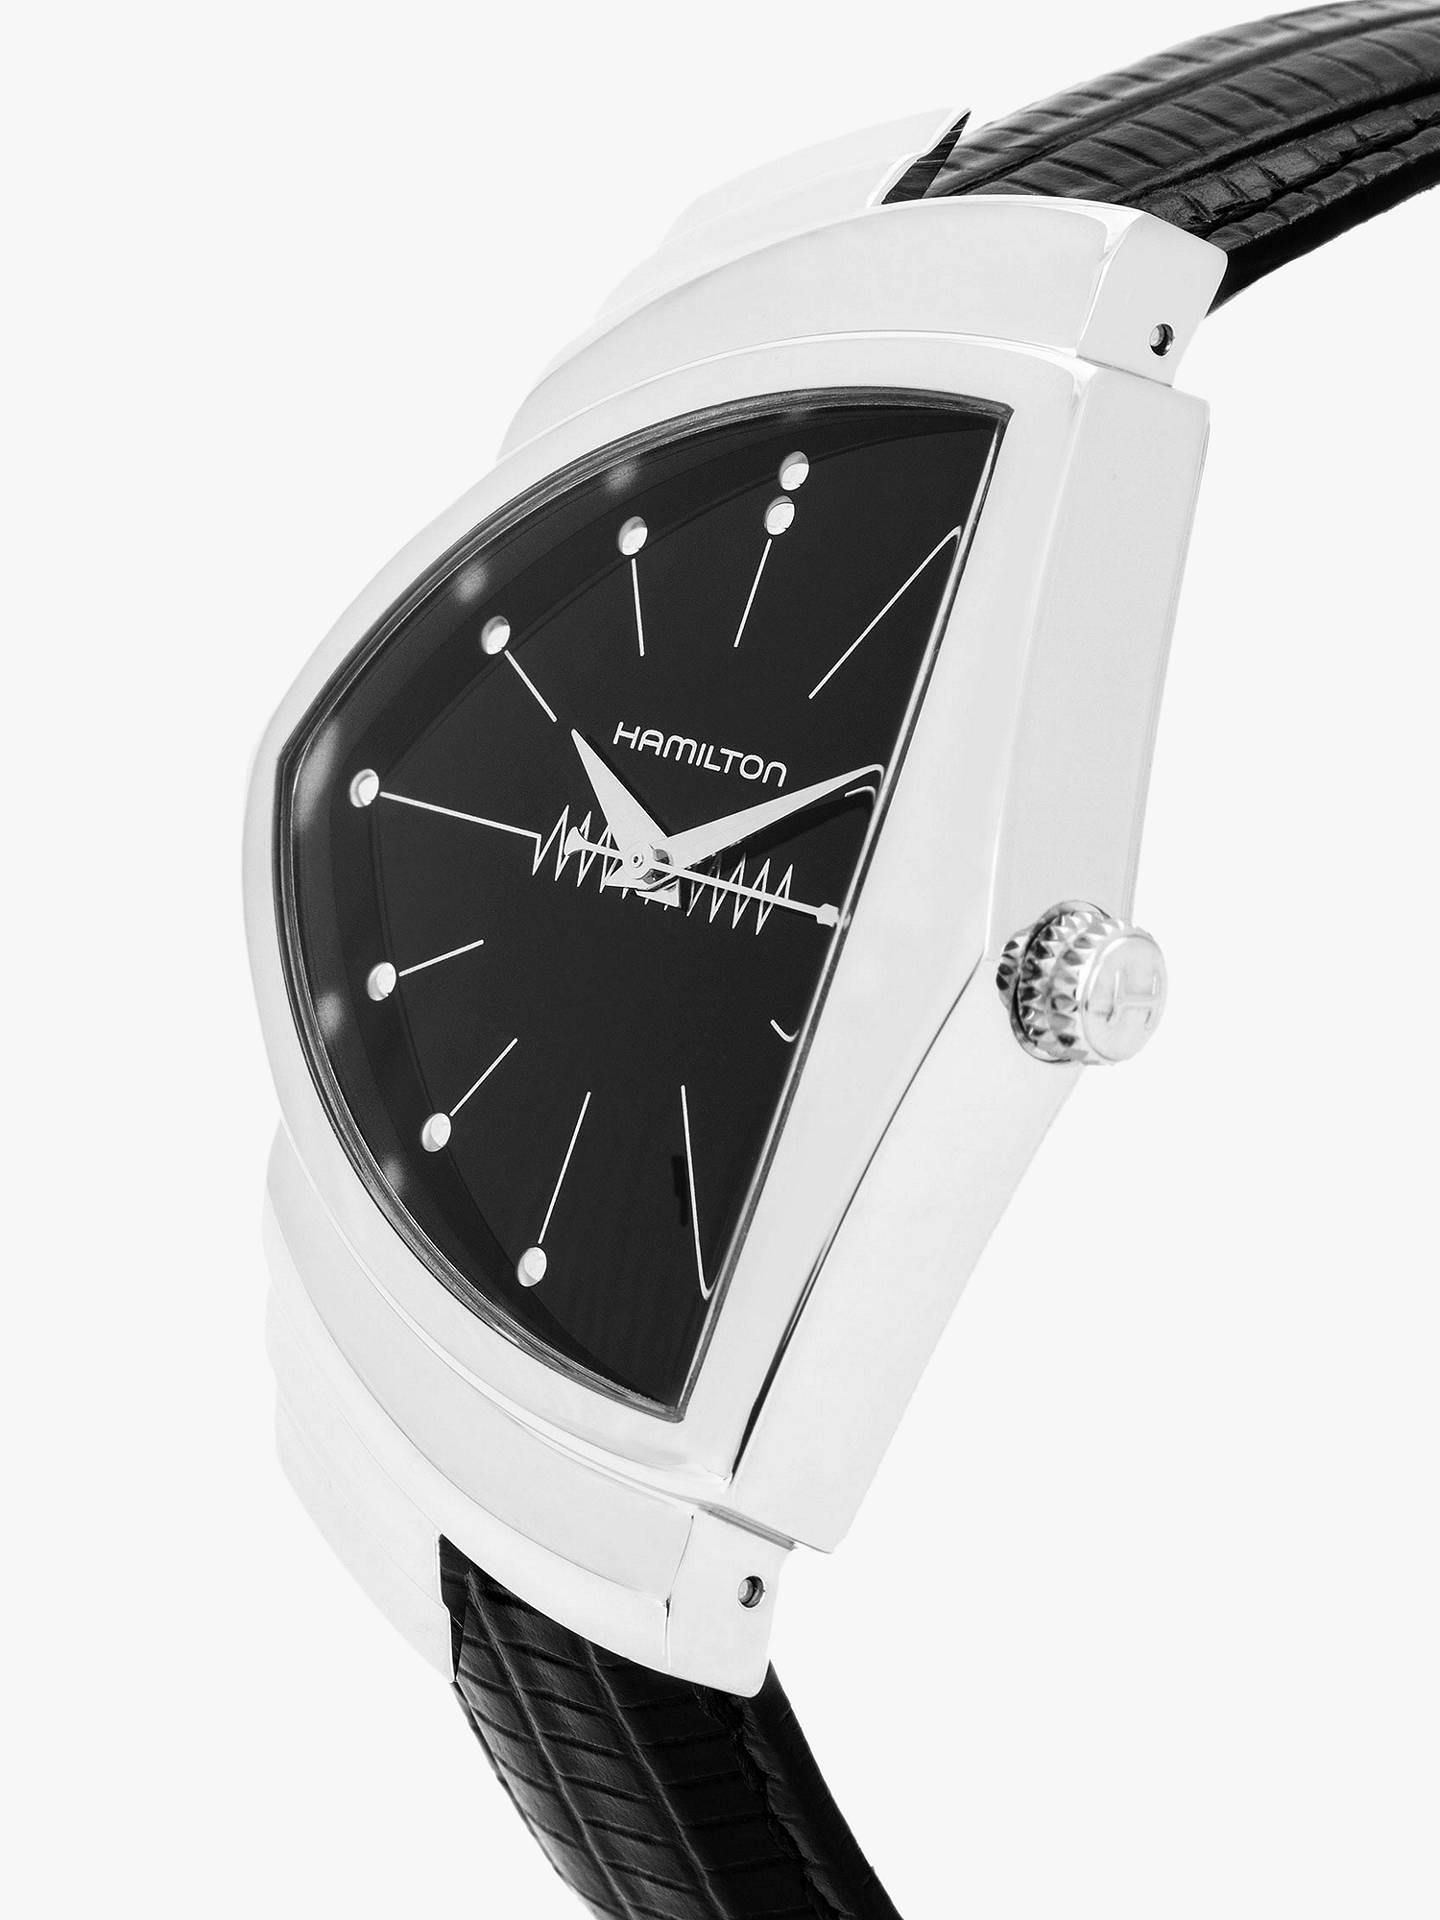 a825b4b7869 ... Buy Hamilton H24411732 Men's Ventura Triangular Leather Strap Watch,  Black Online at johnlewis. ...